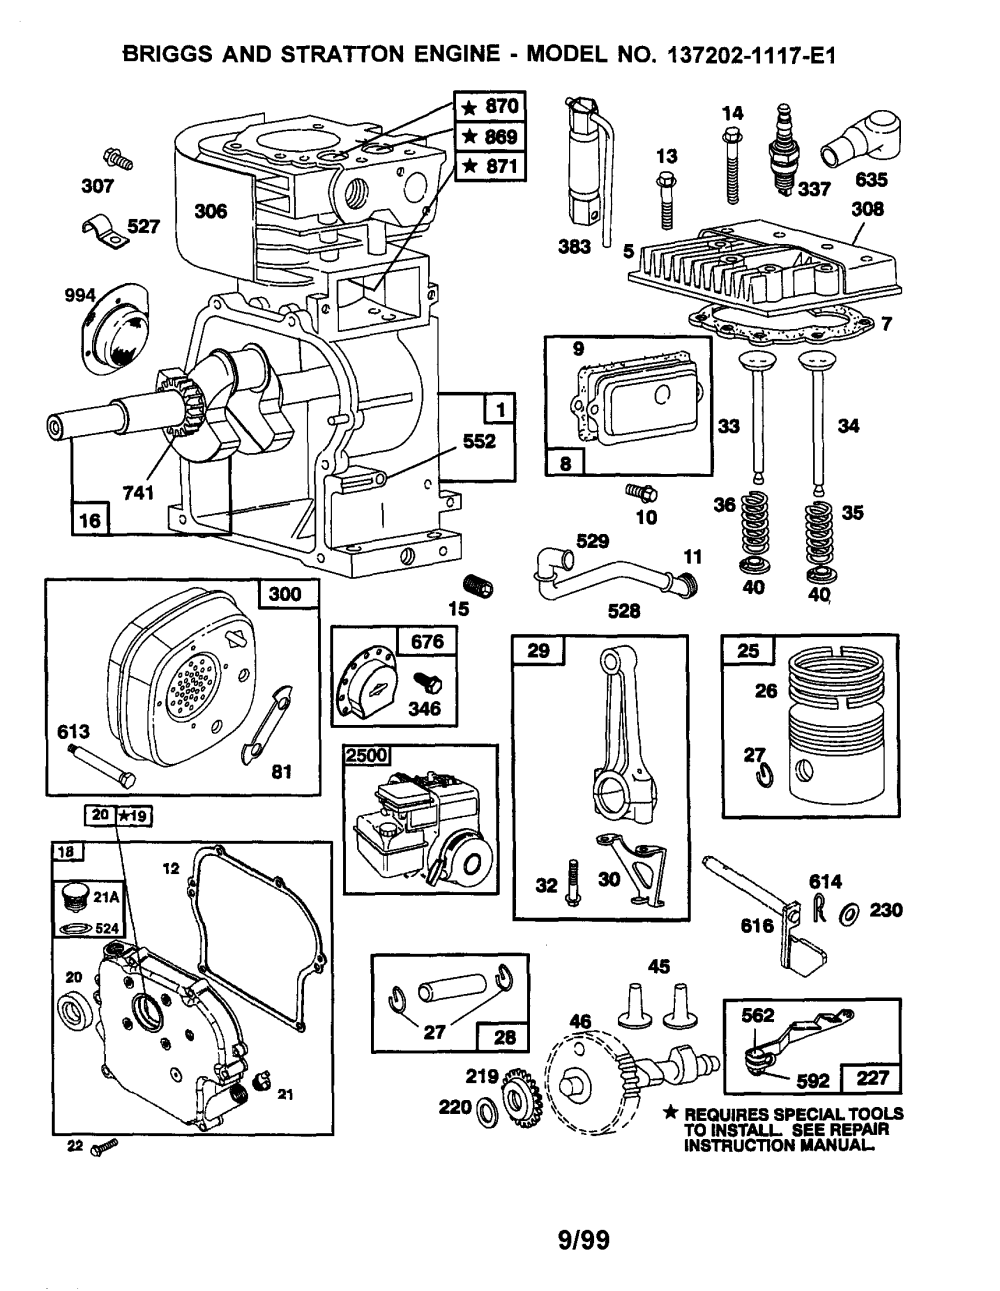 medium resolution of briggs stratton model 137202 1117 e1 engine genuine parts rh searspartsdirect com briggs and stratton engine